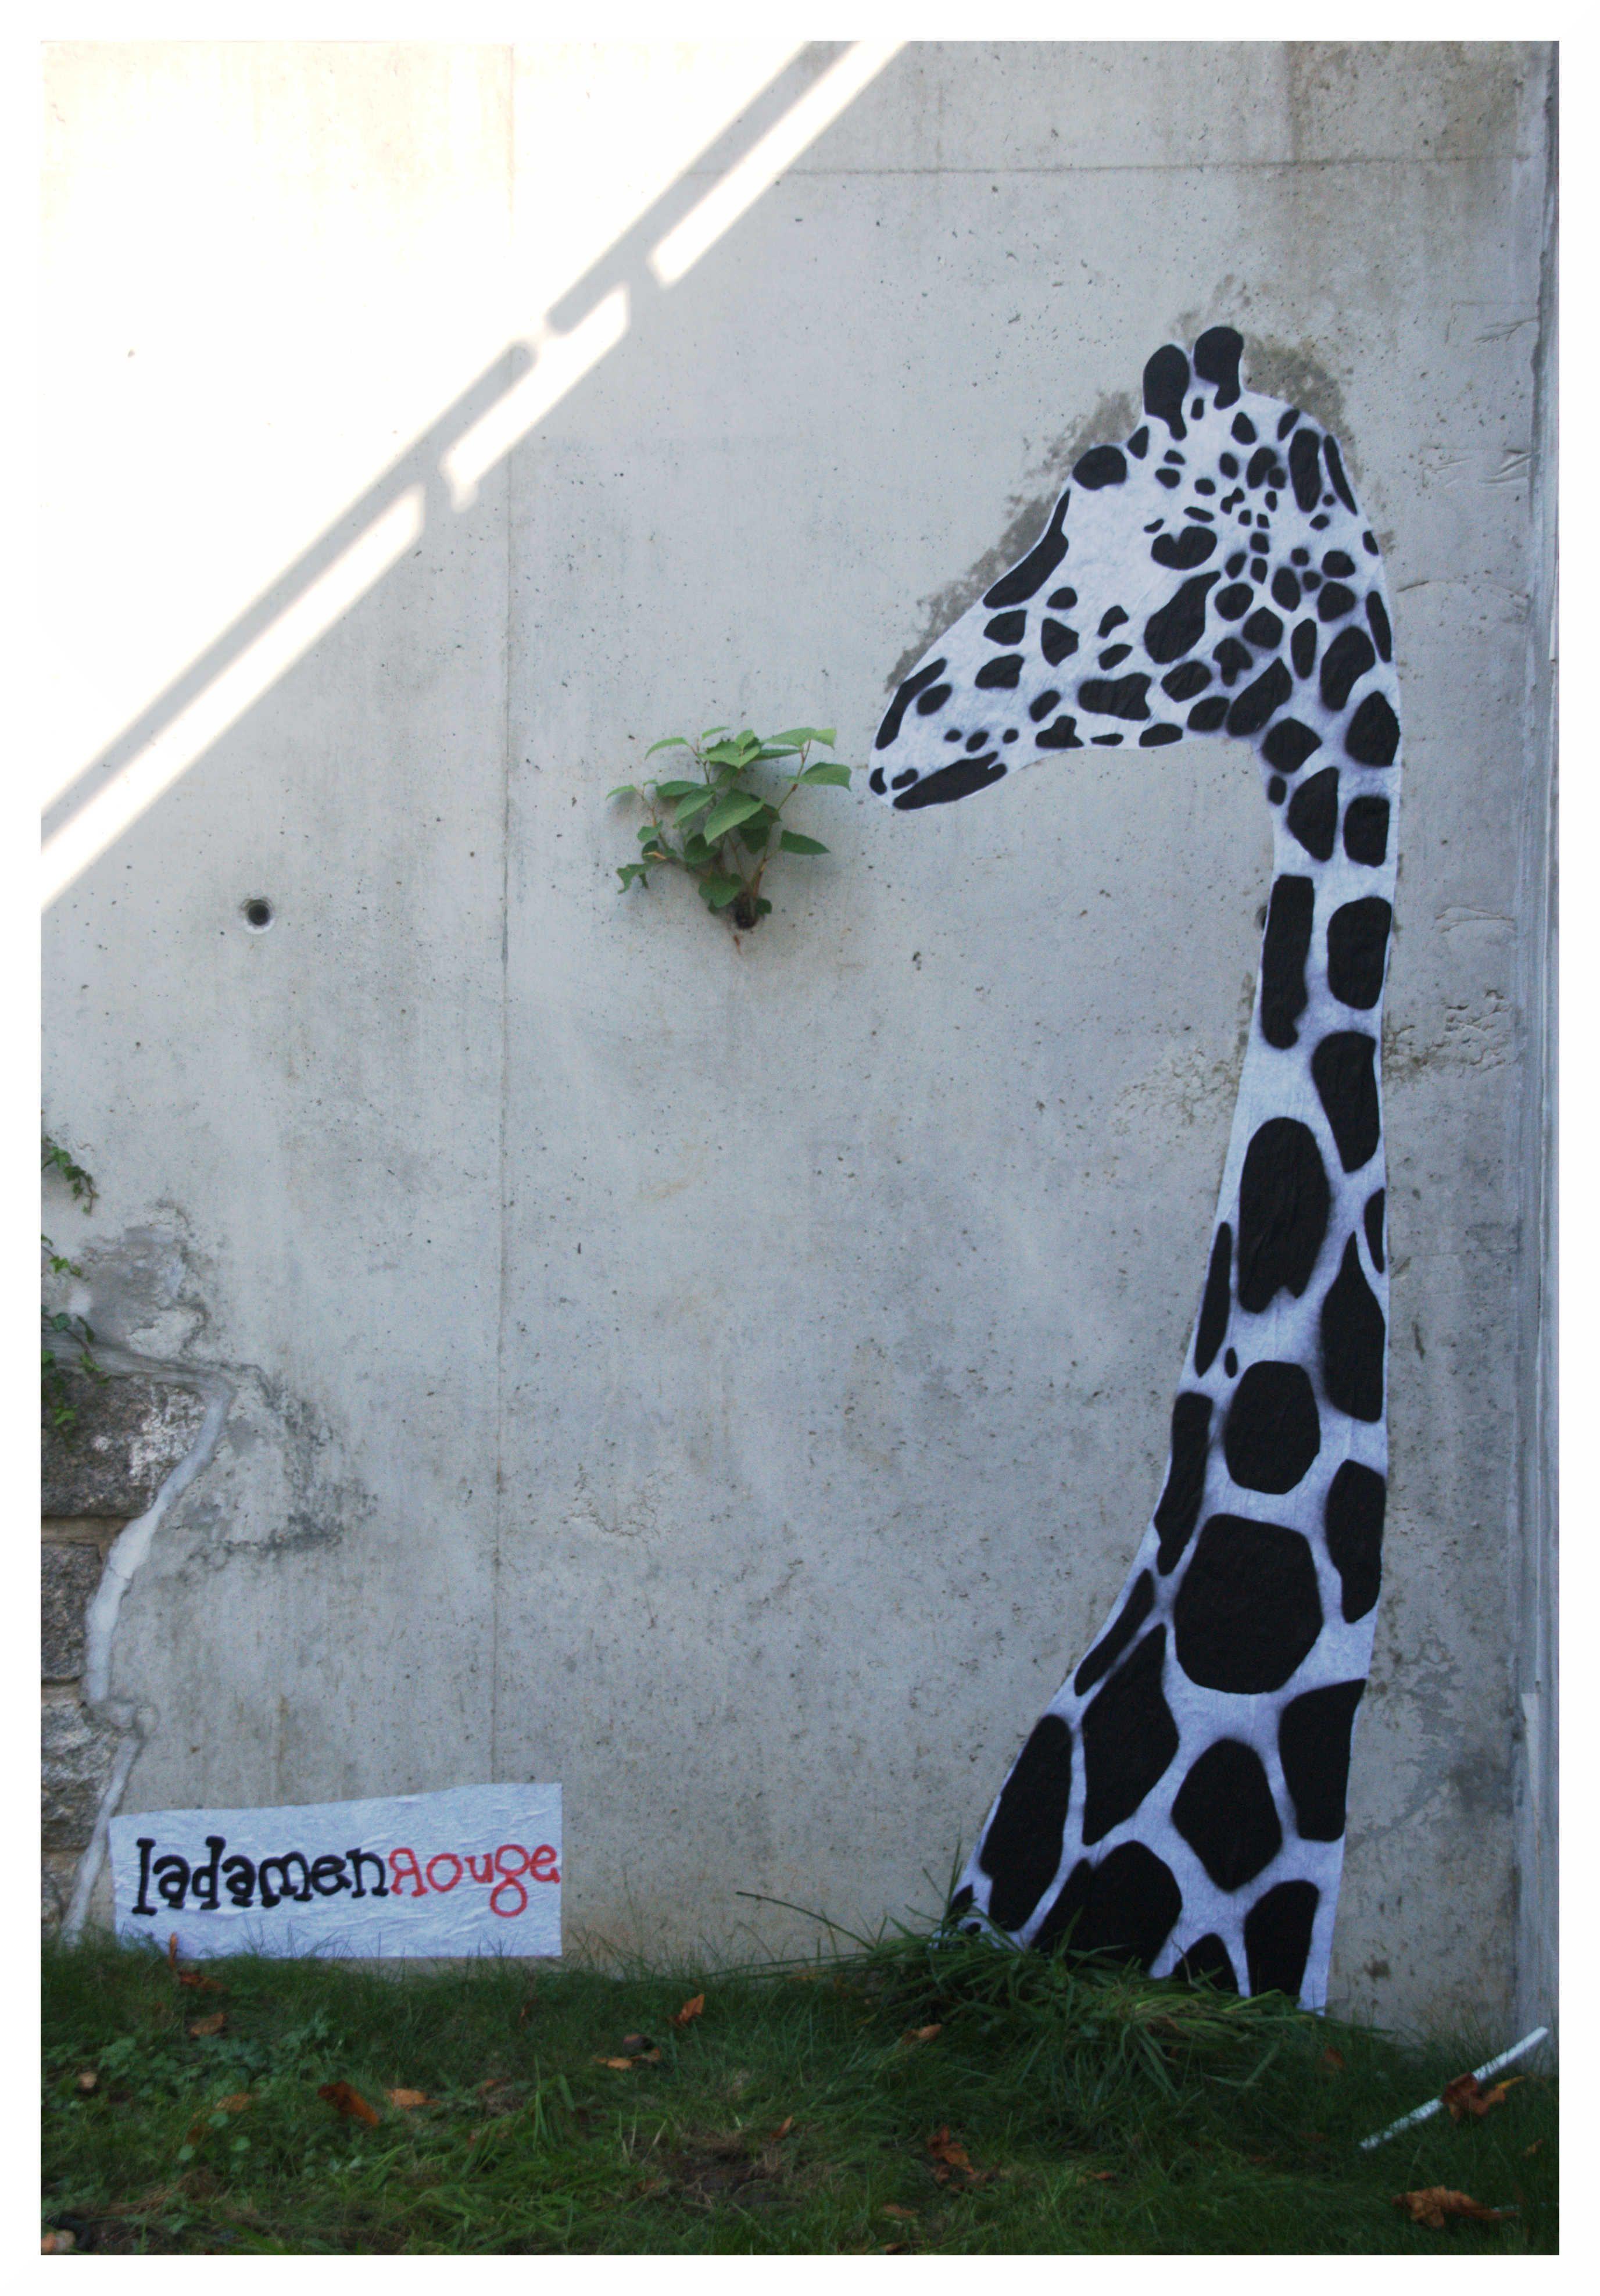 J-RAF Ladamenrouge Street Art St Etienne